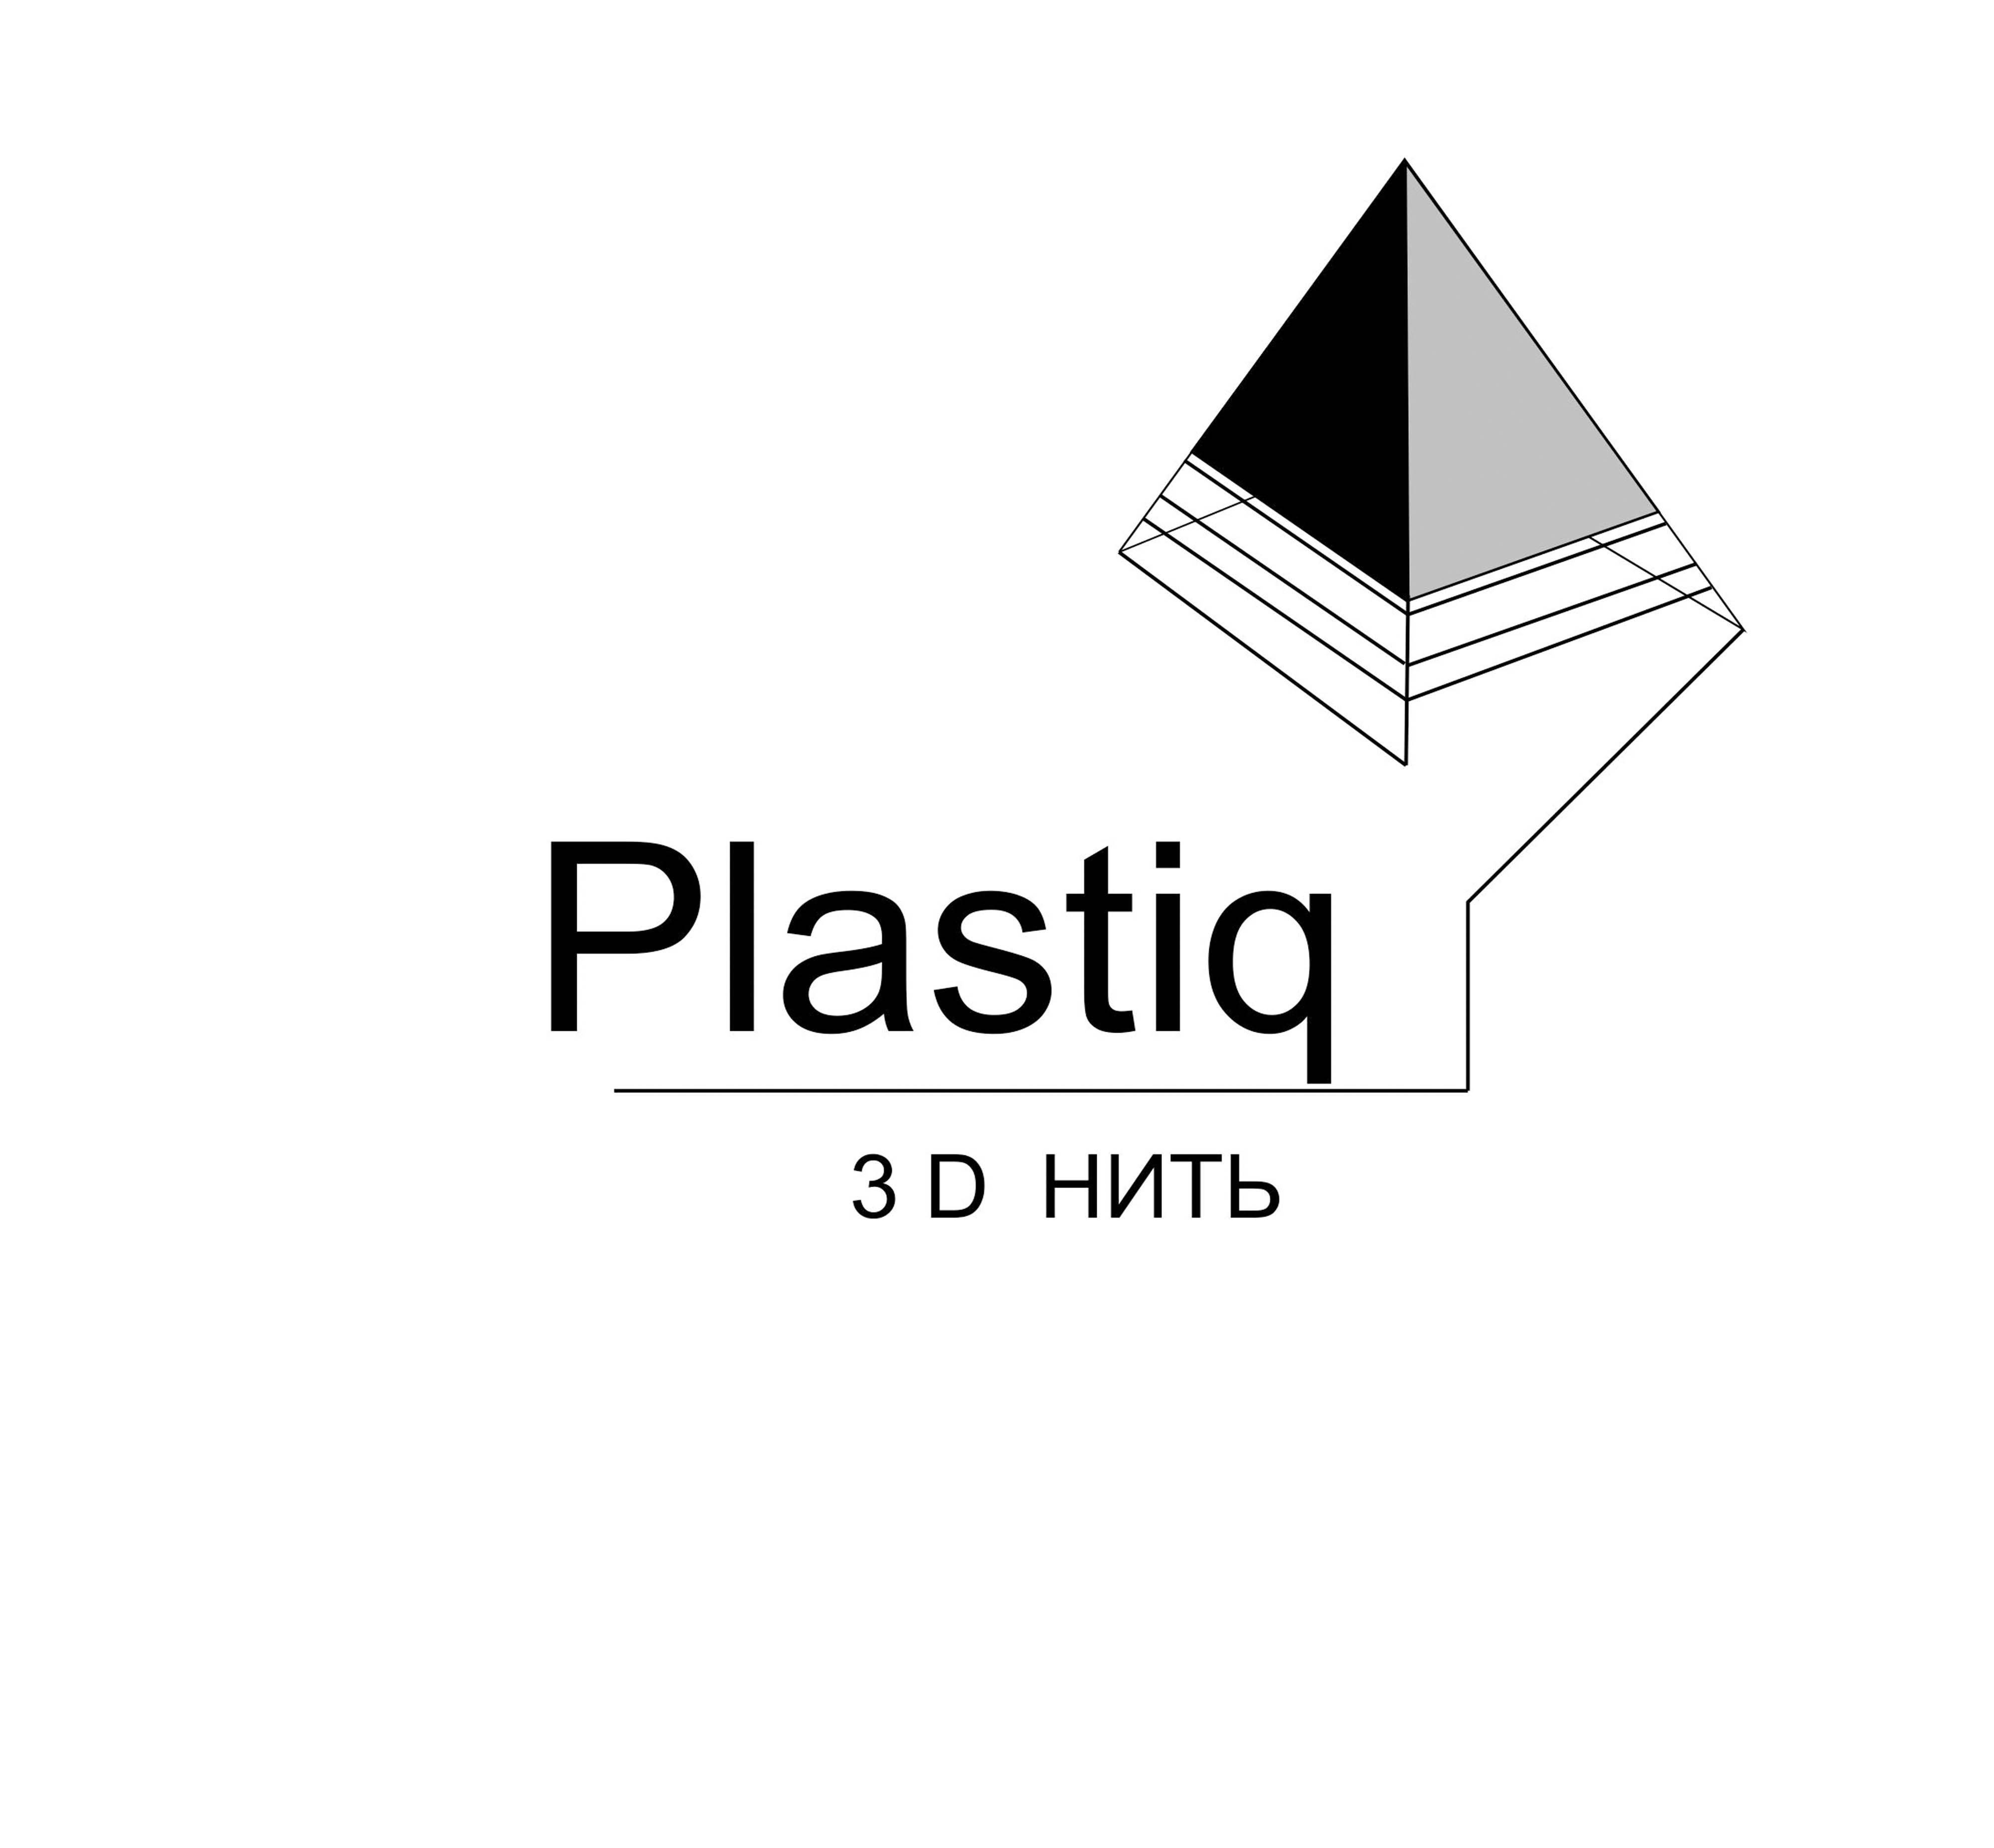 Разработка логотипа, упаковки - 3д нить фото f_0075b6f474eda668.jpg